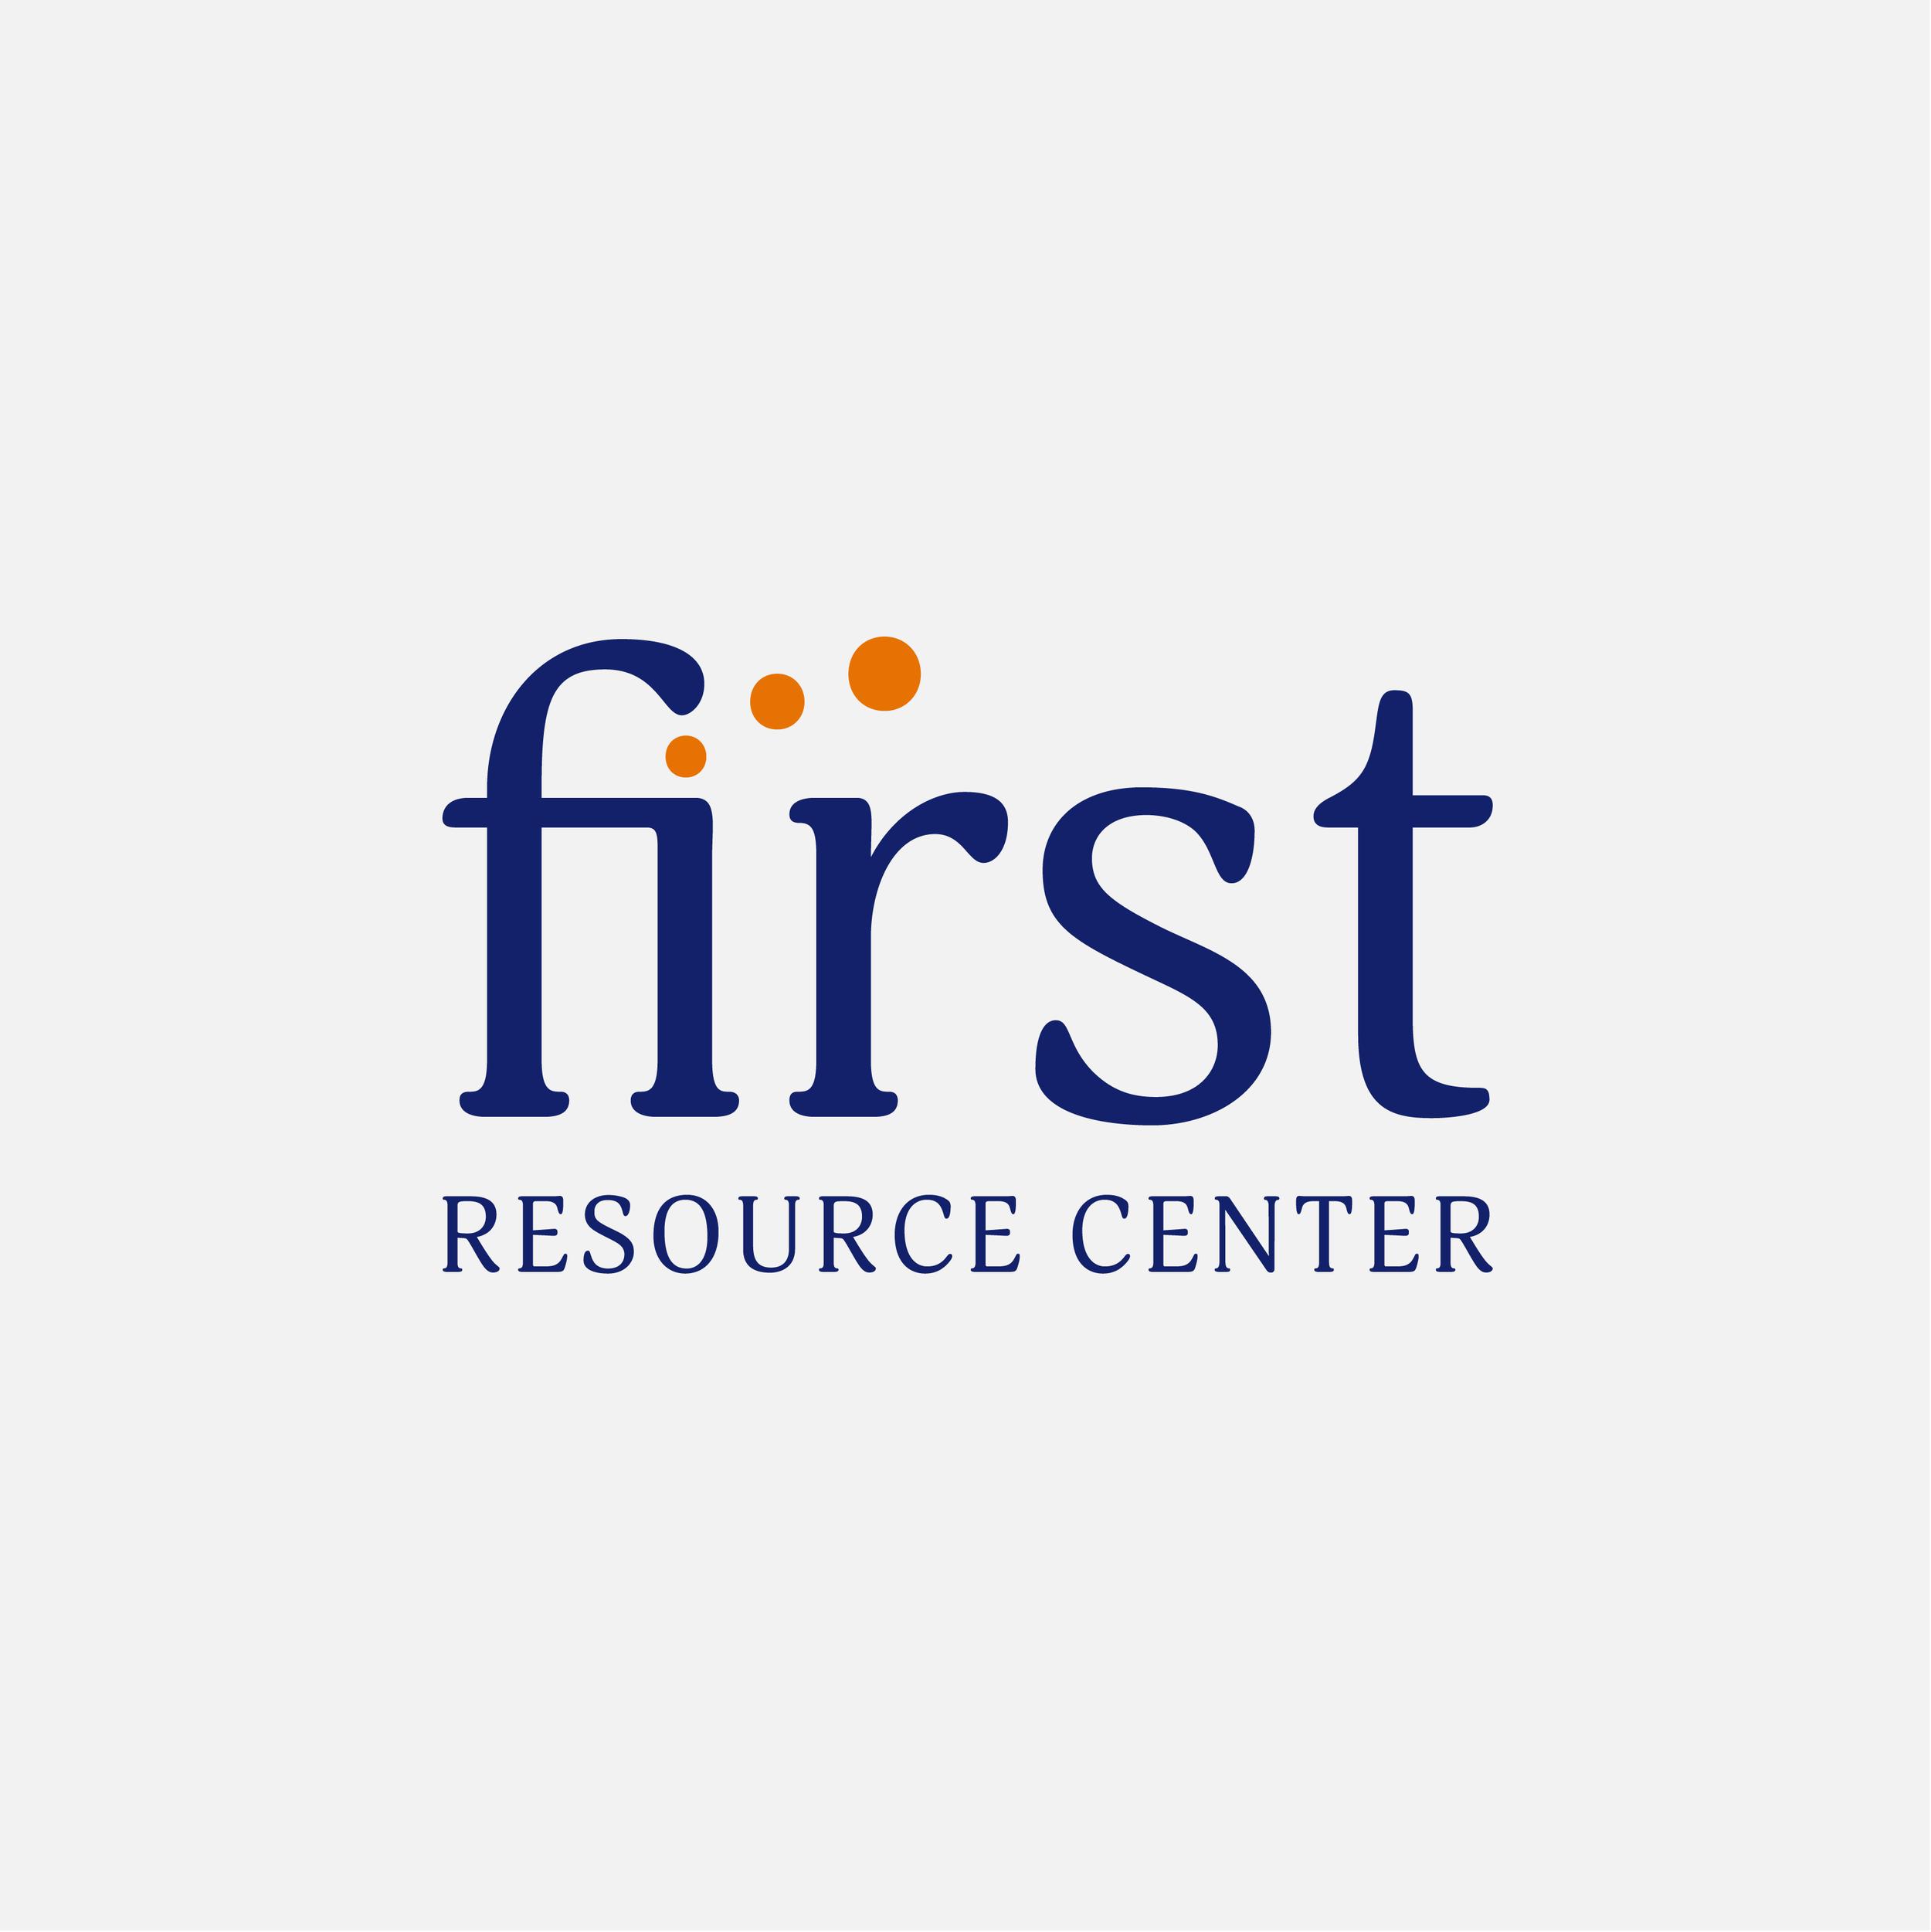 FPC_Logo-01.png